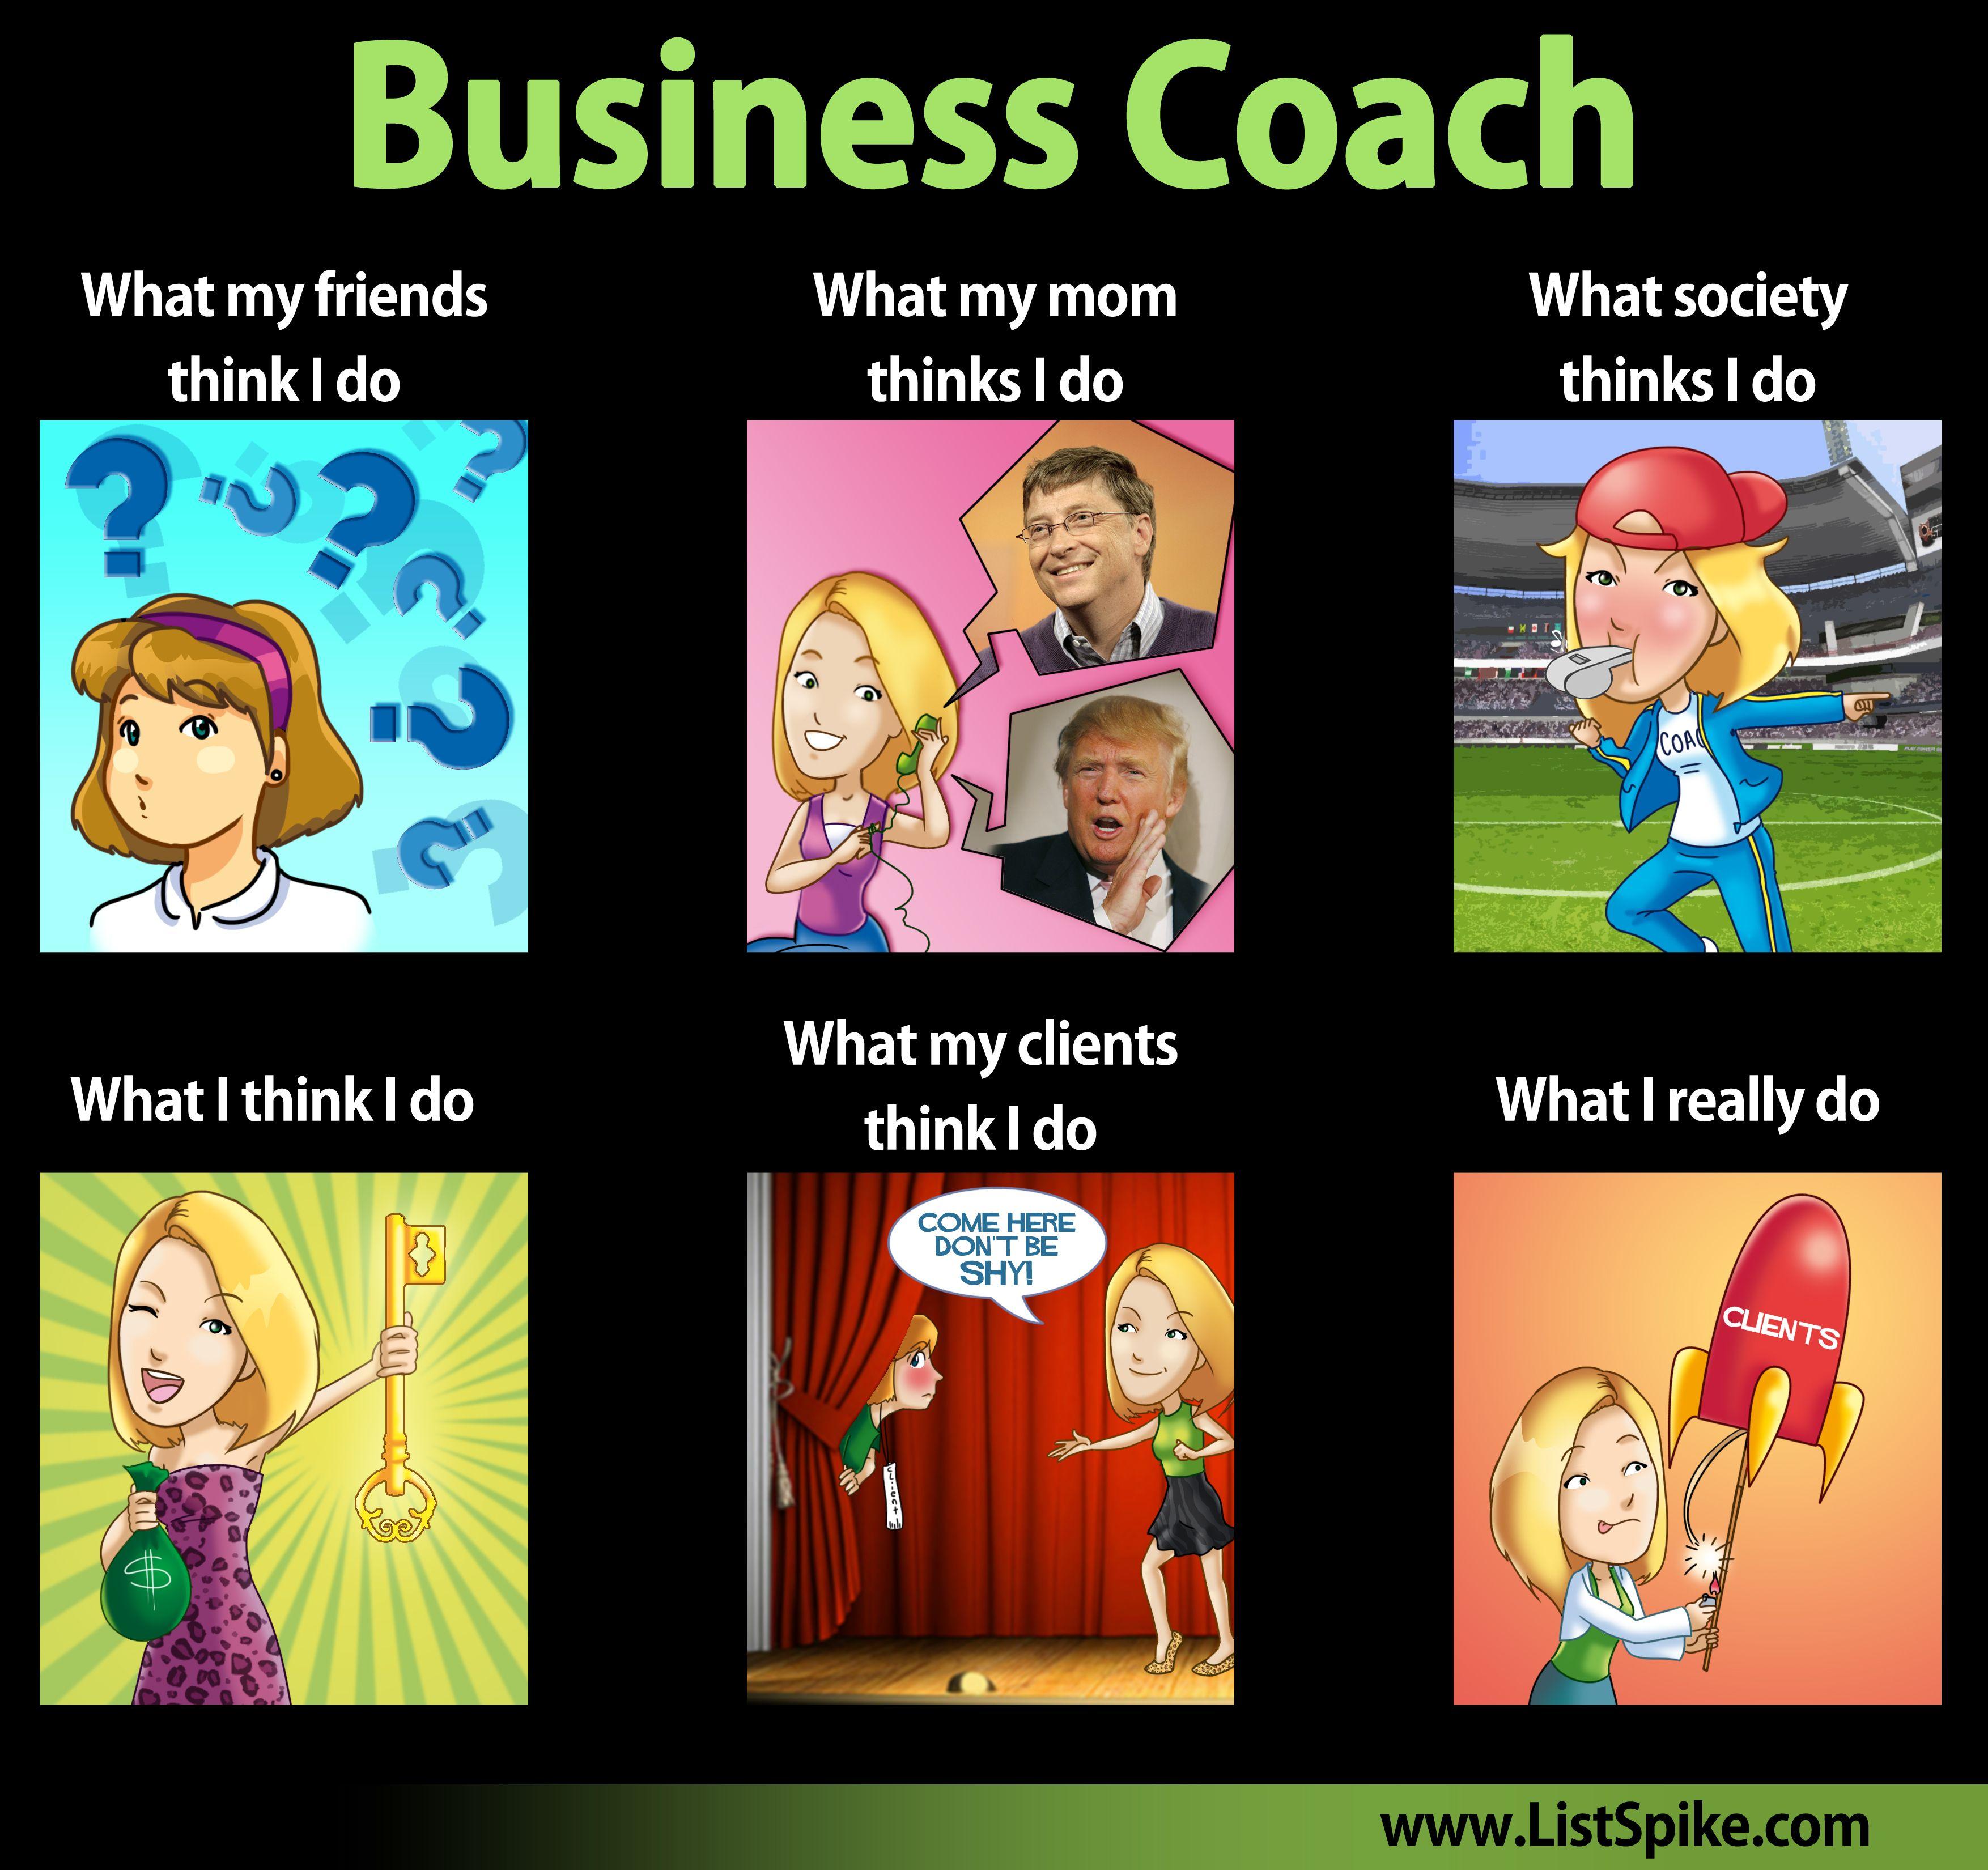 Business Coach Meme Small Business Coaching Coaching Business Business Meme